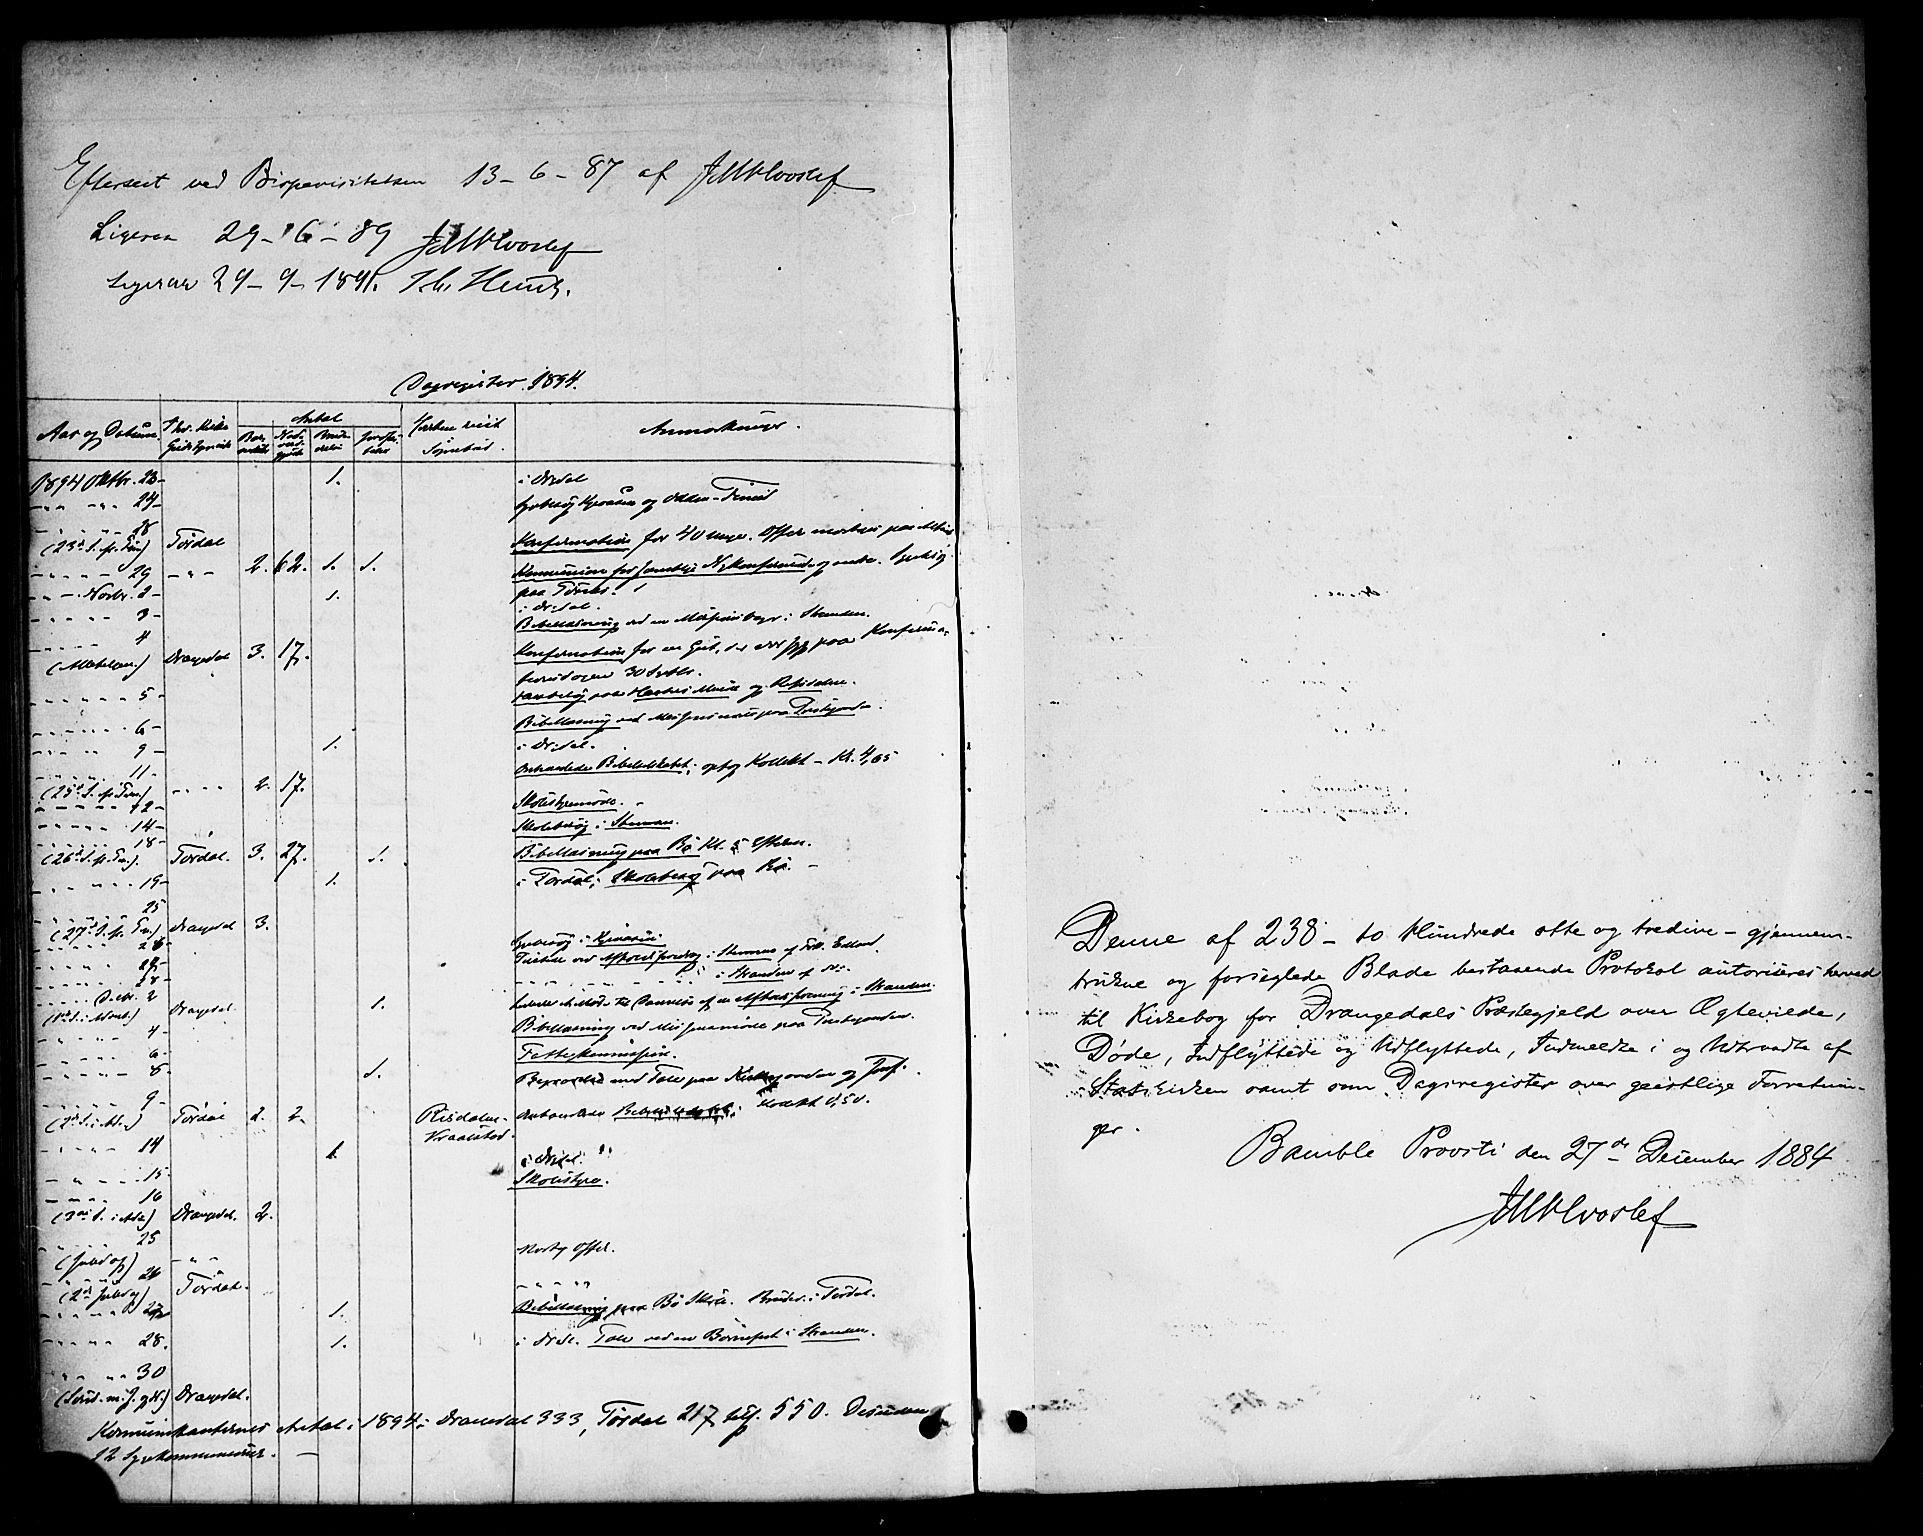 SAKO, Drangedal kirkebøker, F/Fa/L0011: Ministerialbok nr. 11 /1, 1885-1894